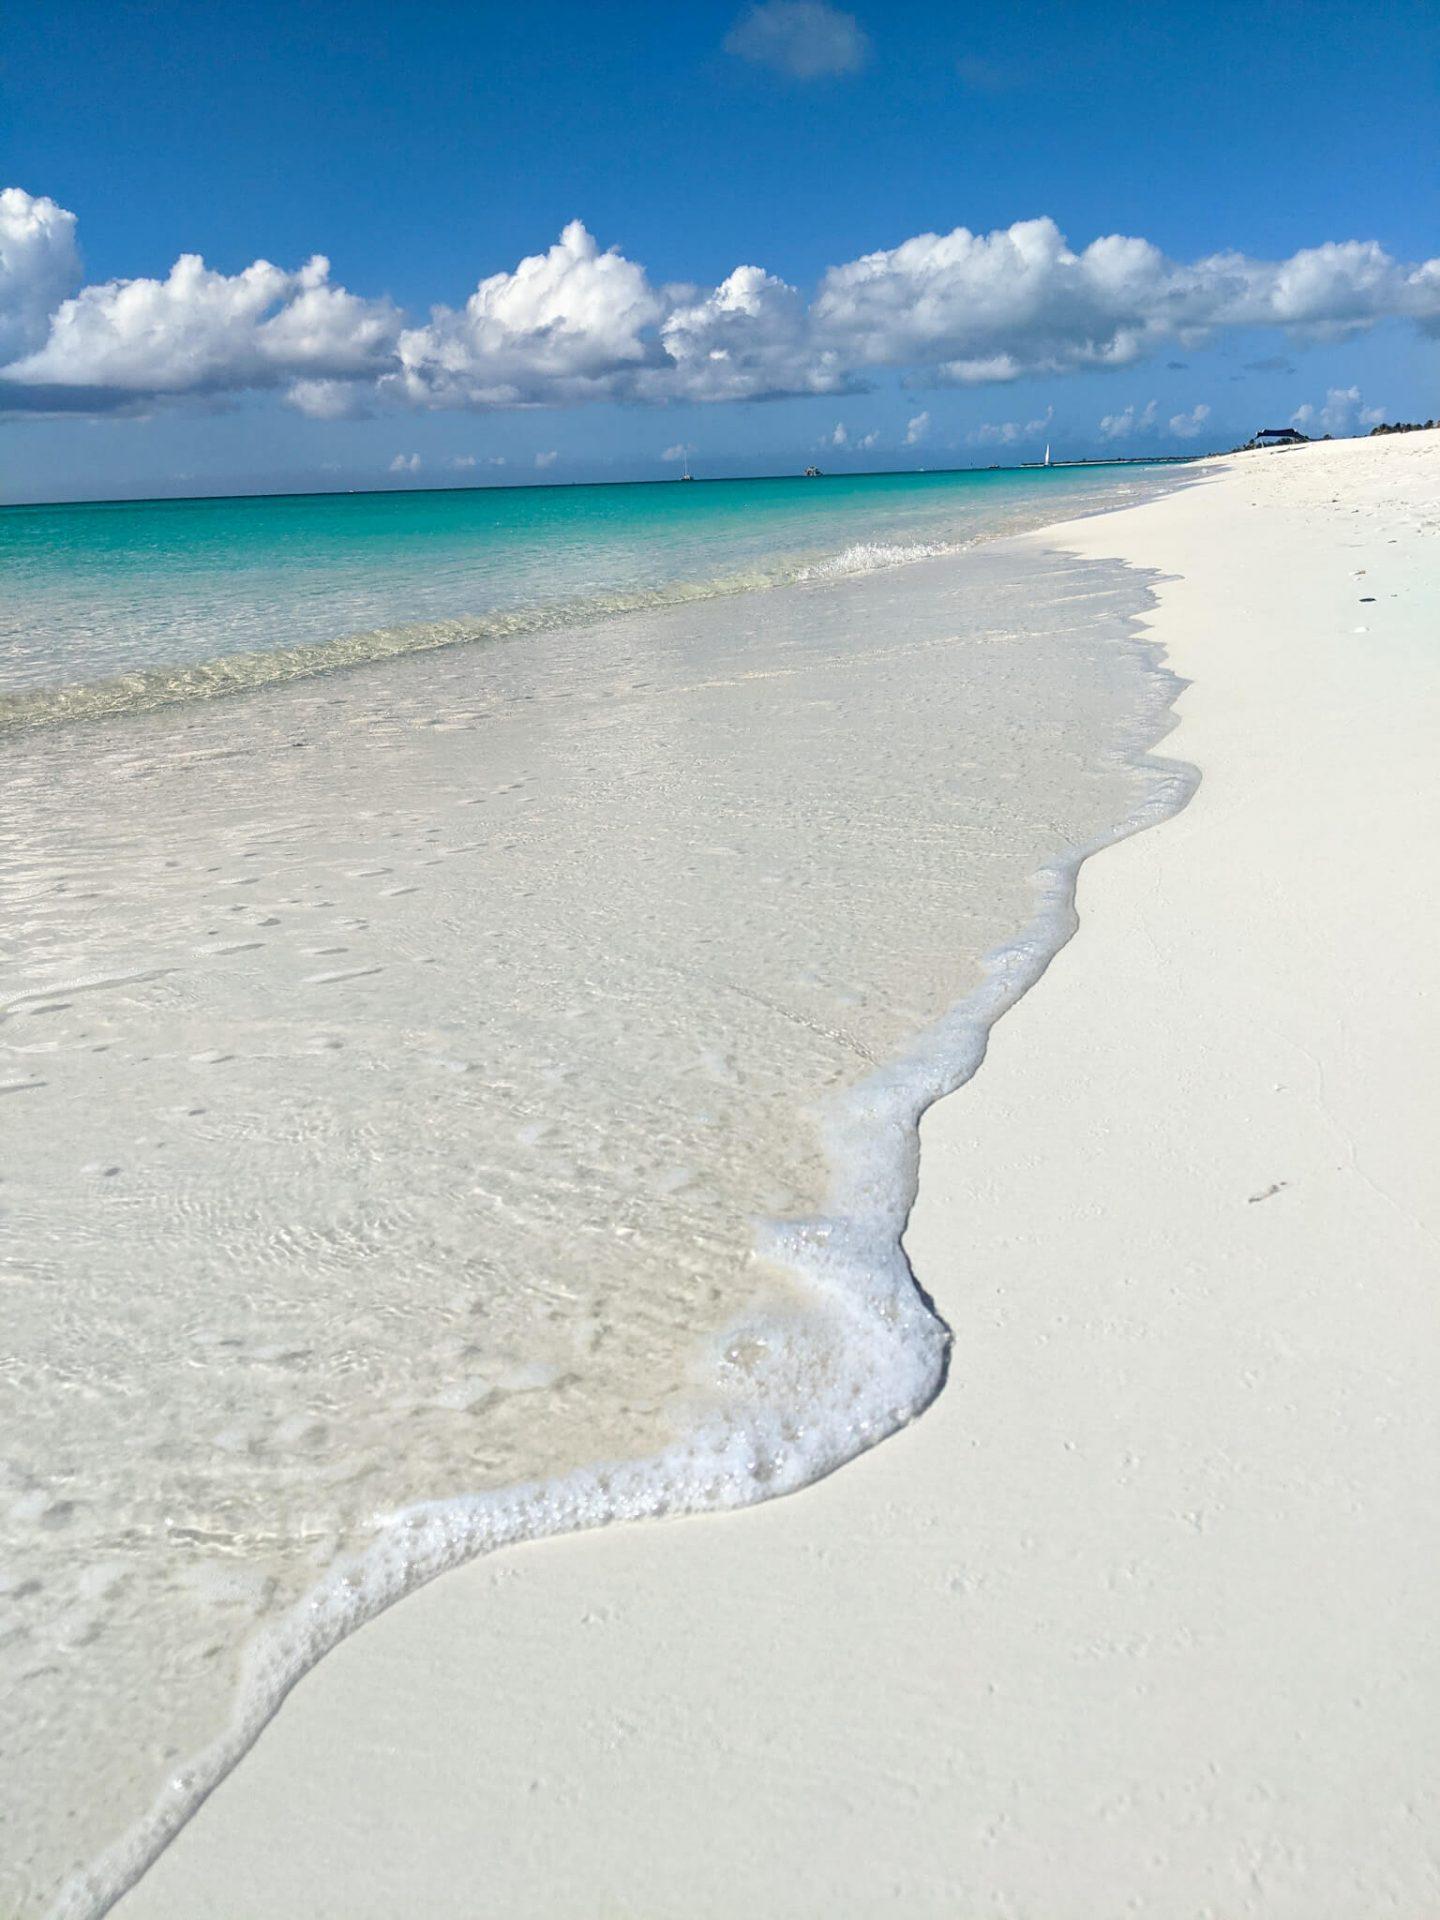 Leeward Beach in Turks & Caicos